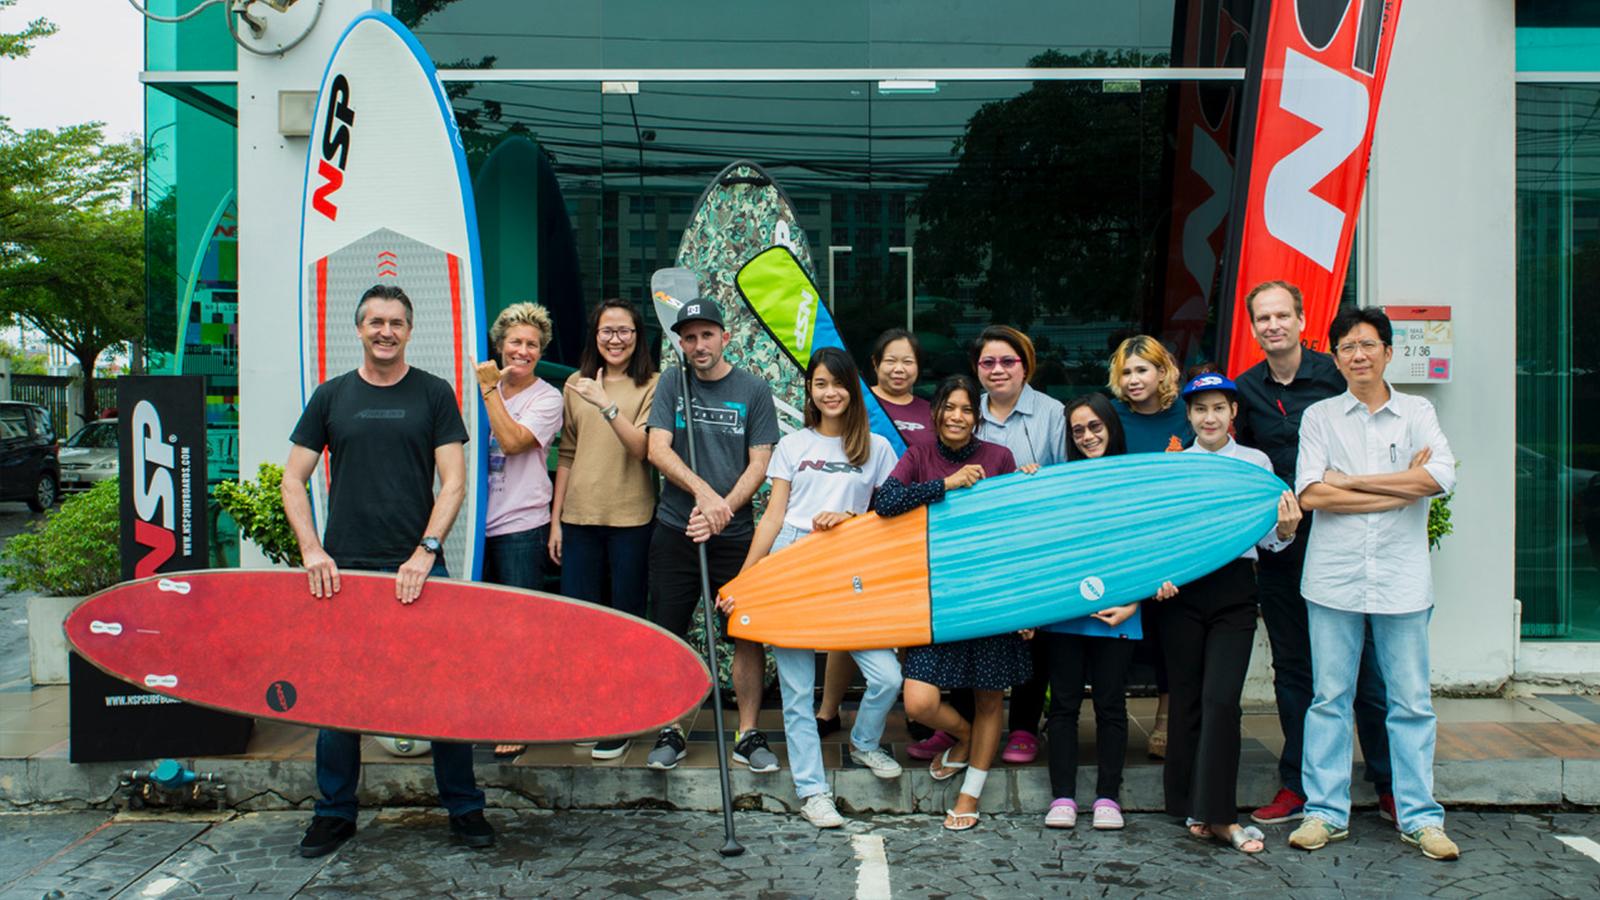 NSP-SURFBOARDS